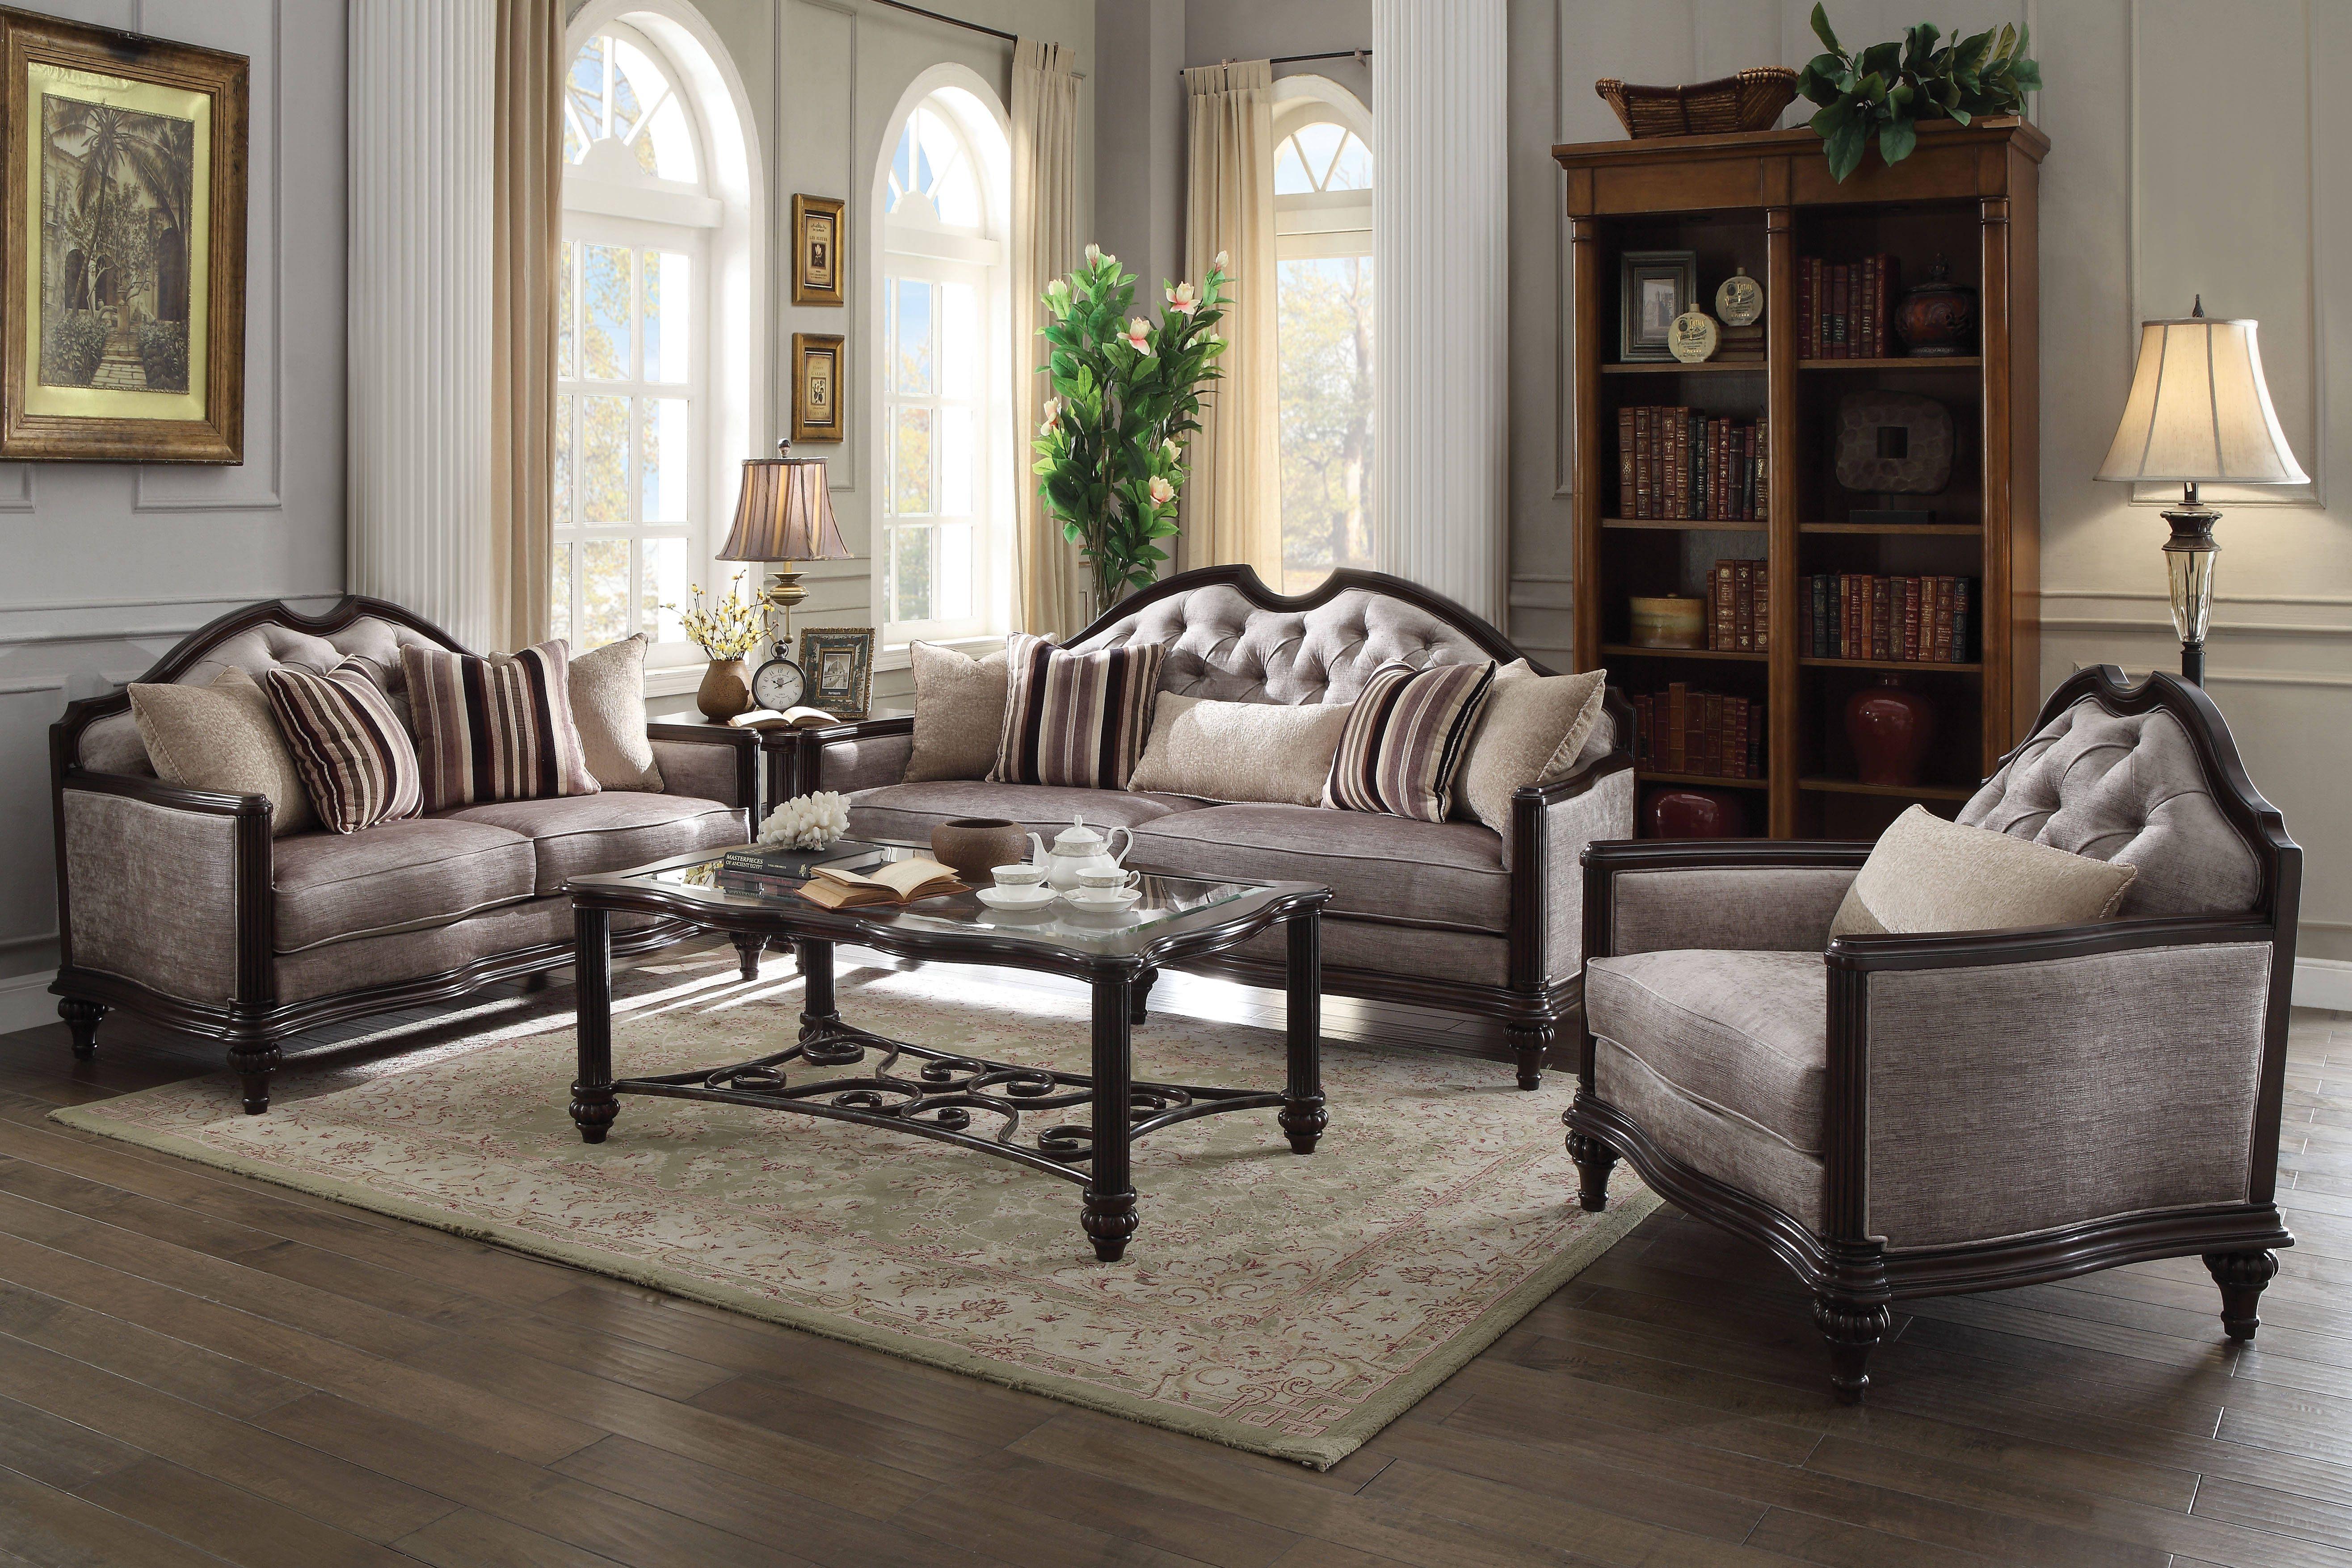 Azis traditional gray dark fabric walnut wood foam living room set